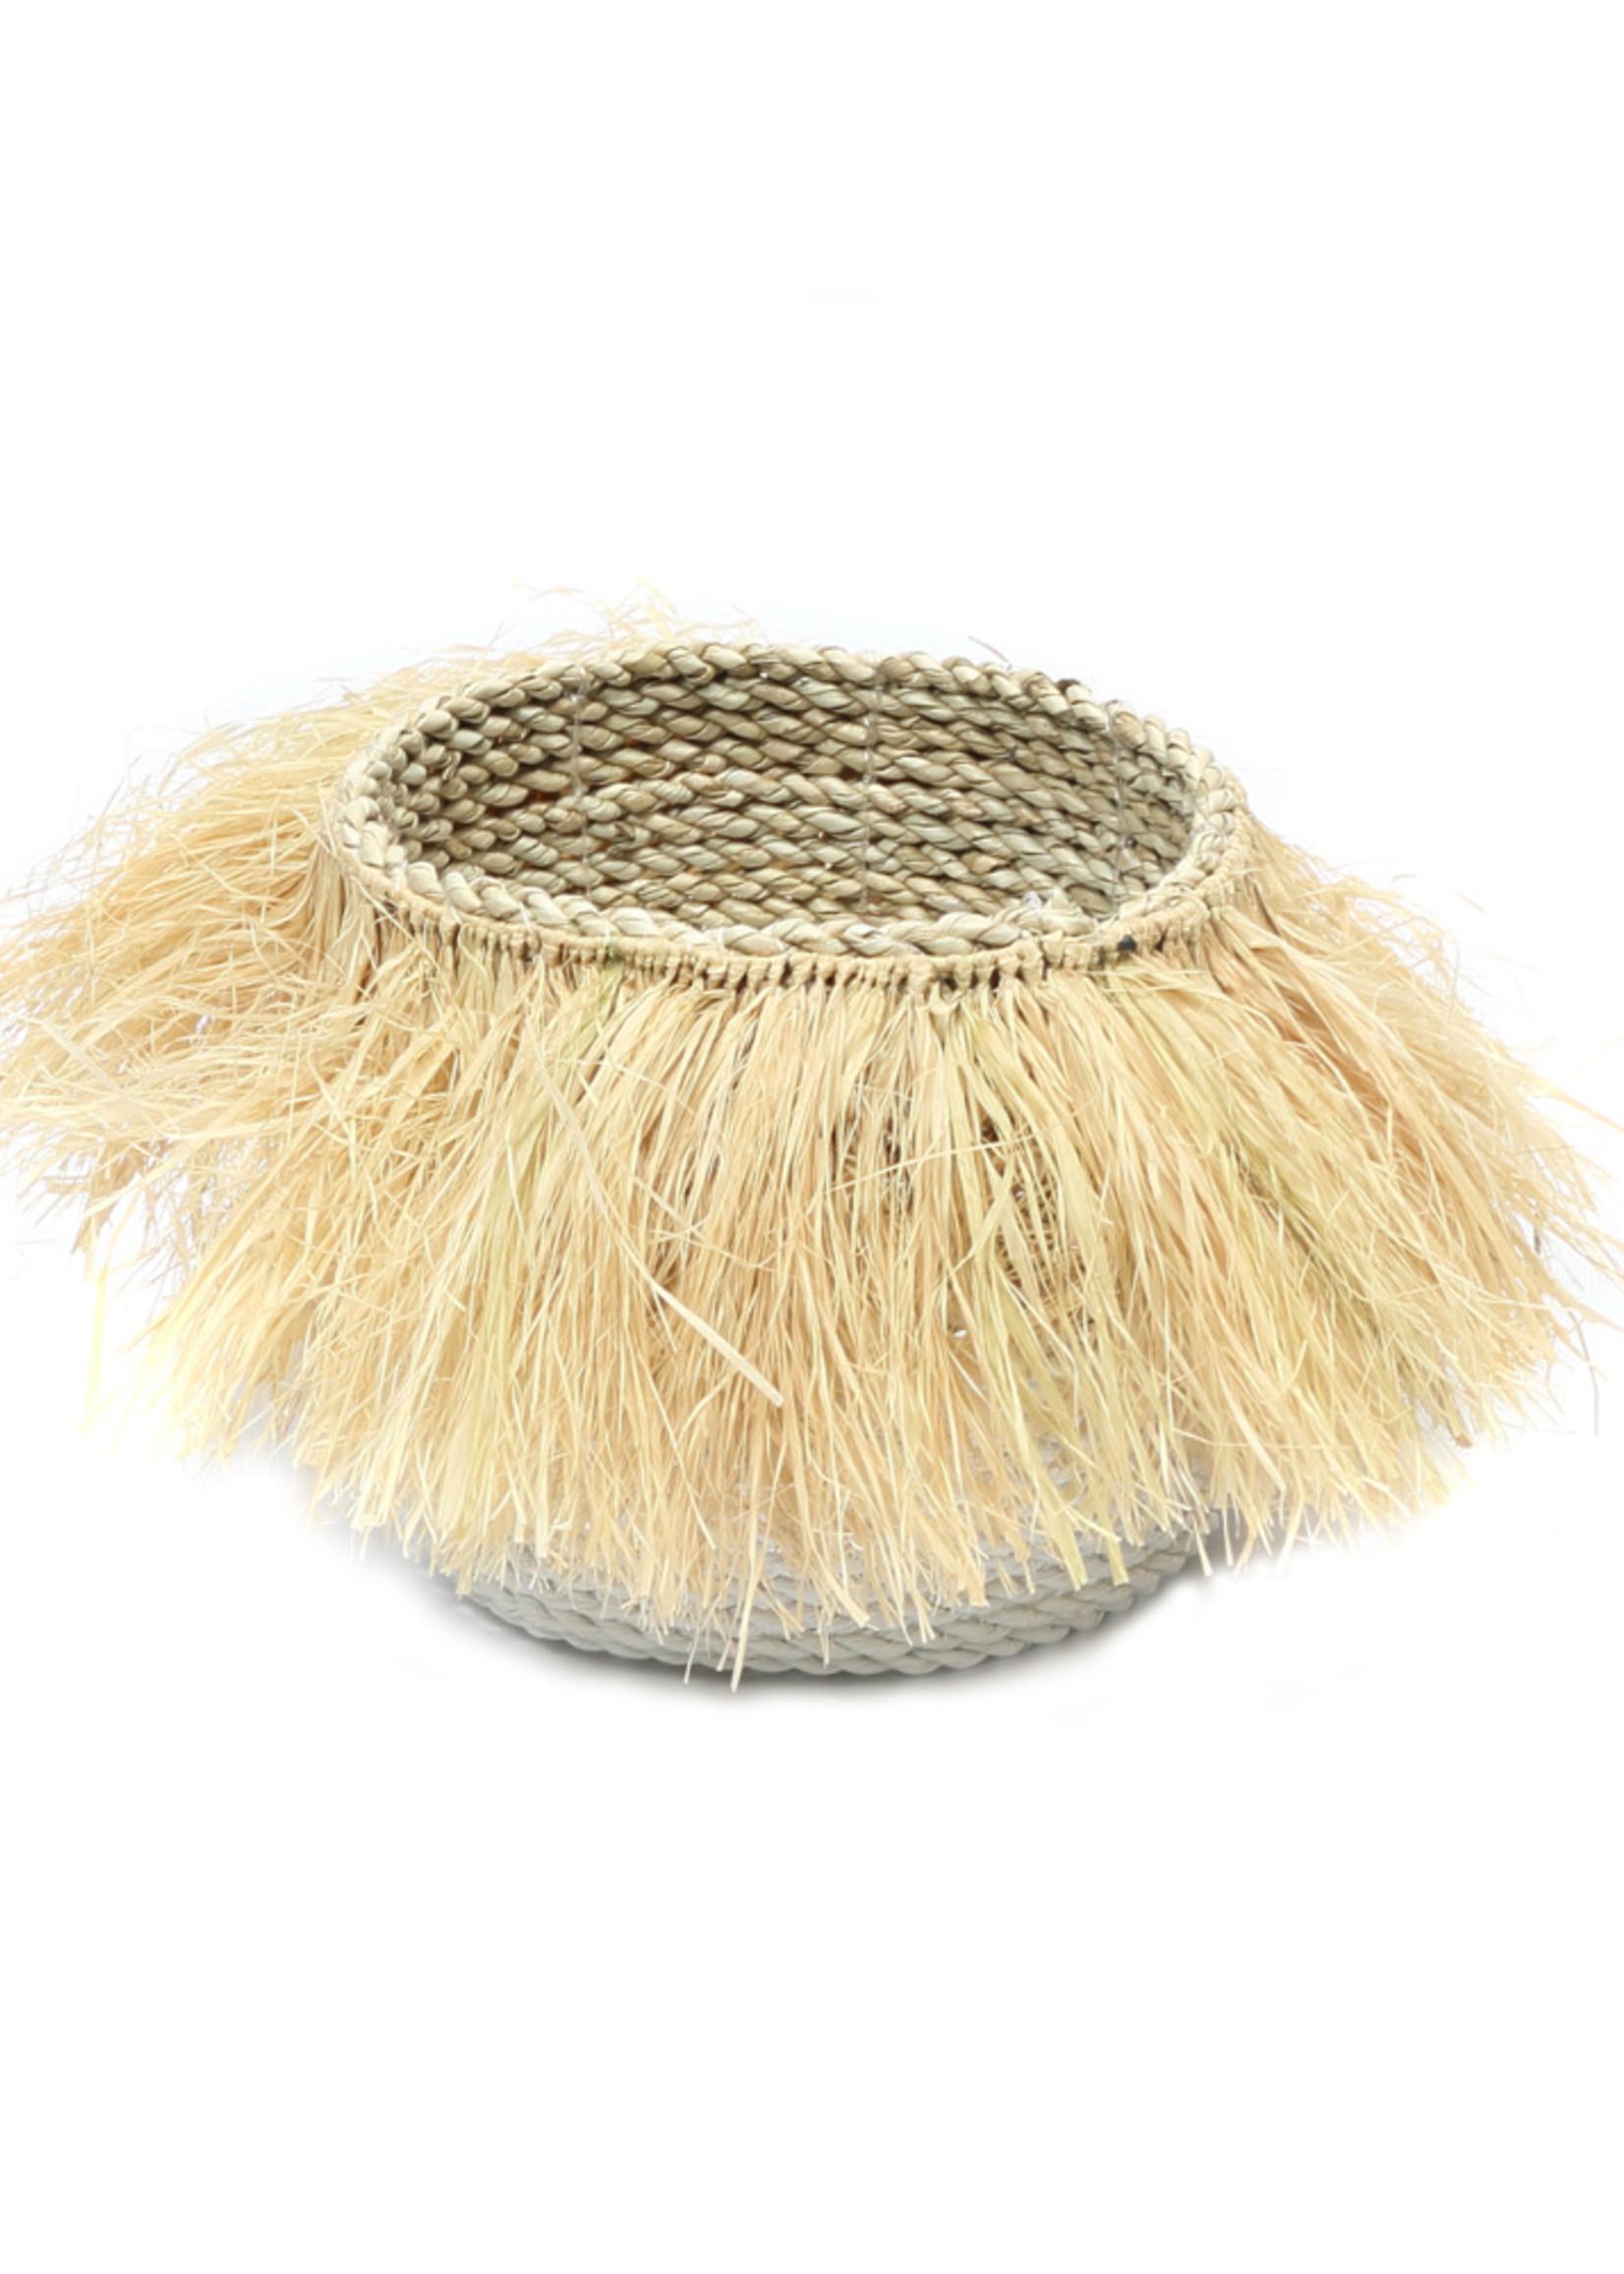 The Aloha Baskets - White Natural - S